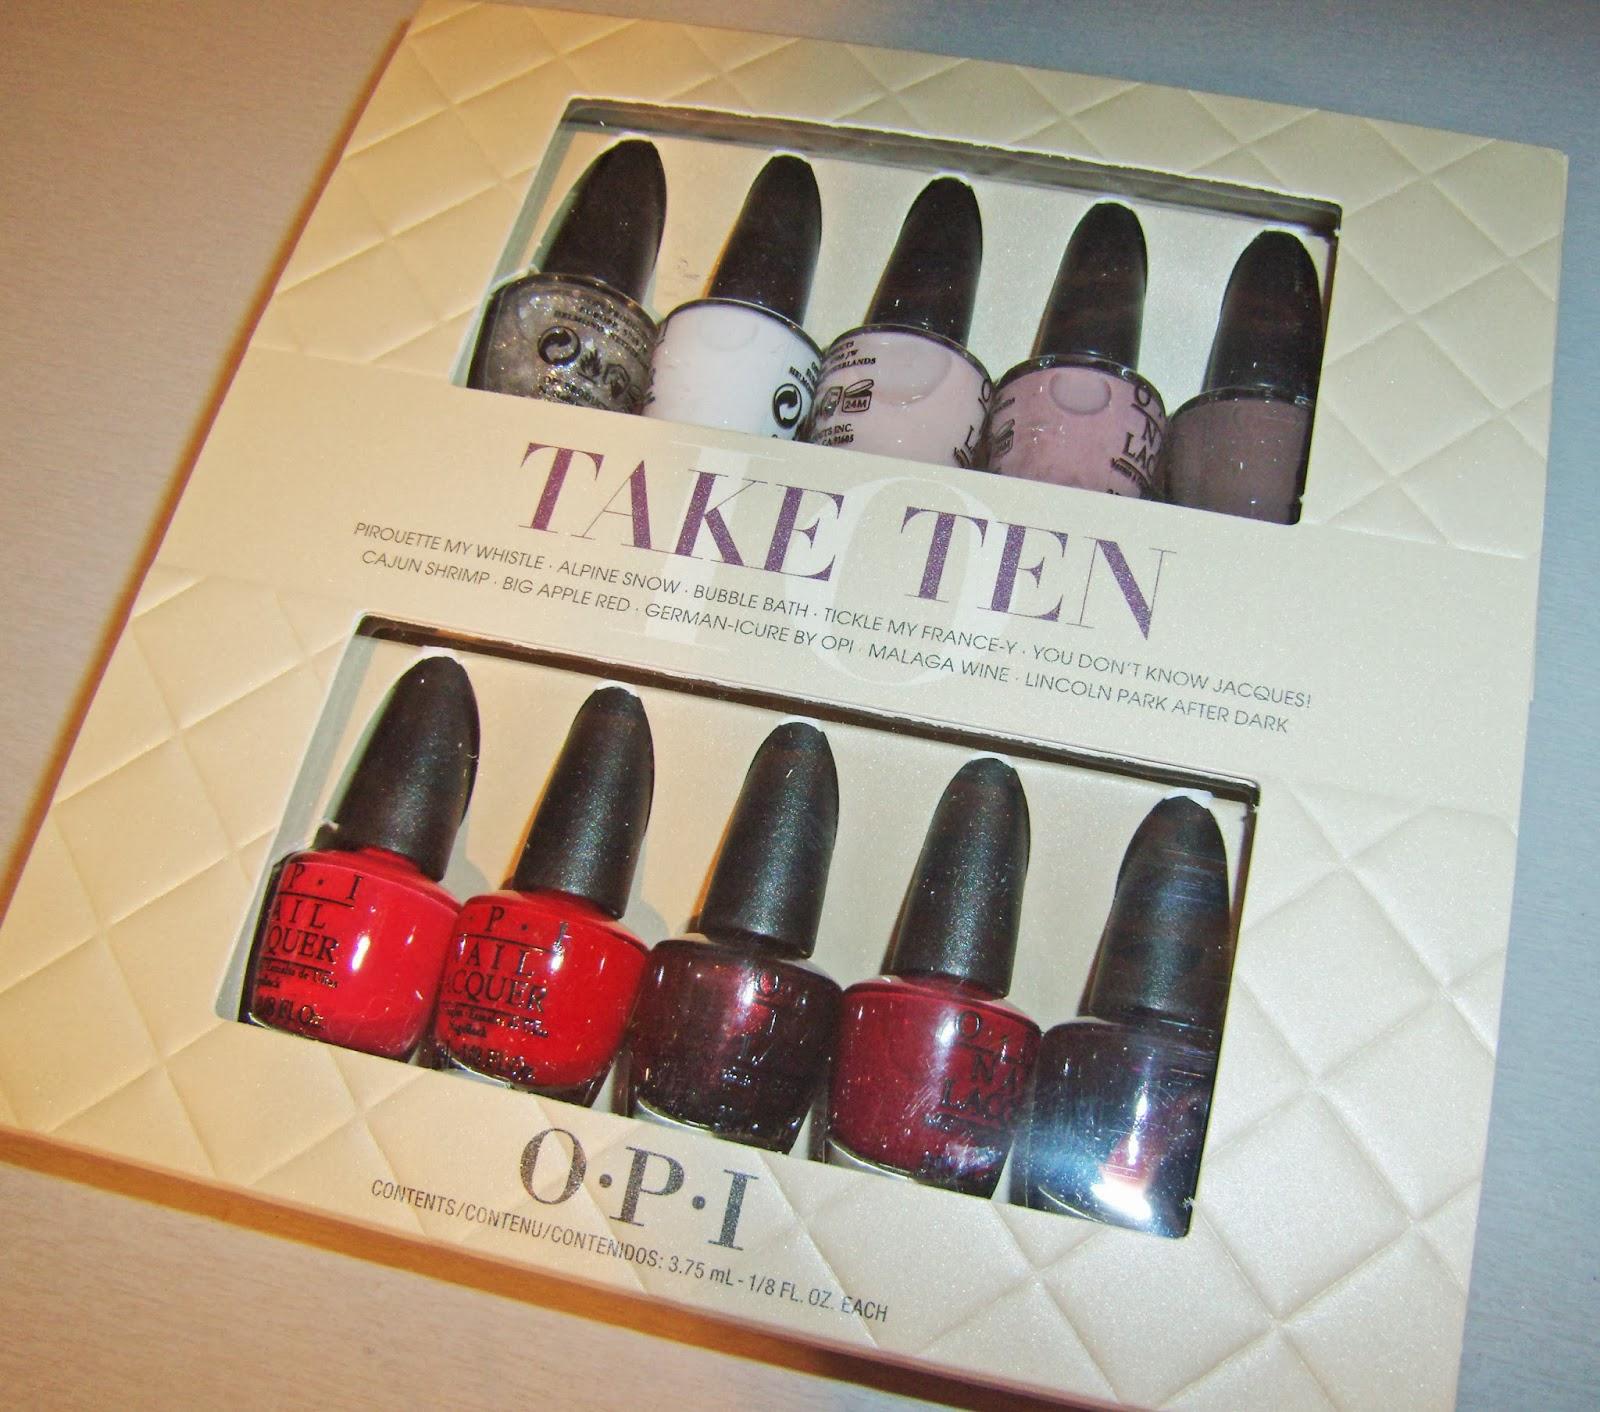 Mini Opi Nail Polish Gift Sets | Splendid Wedding Company